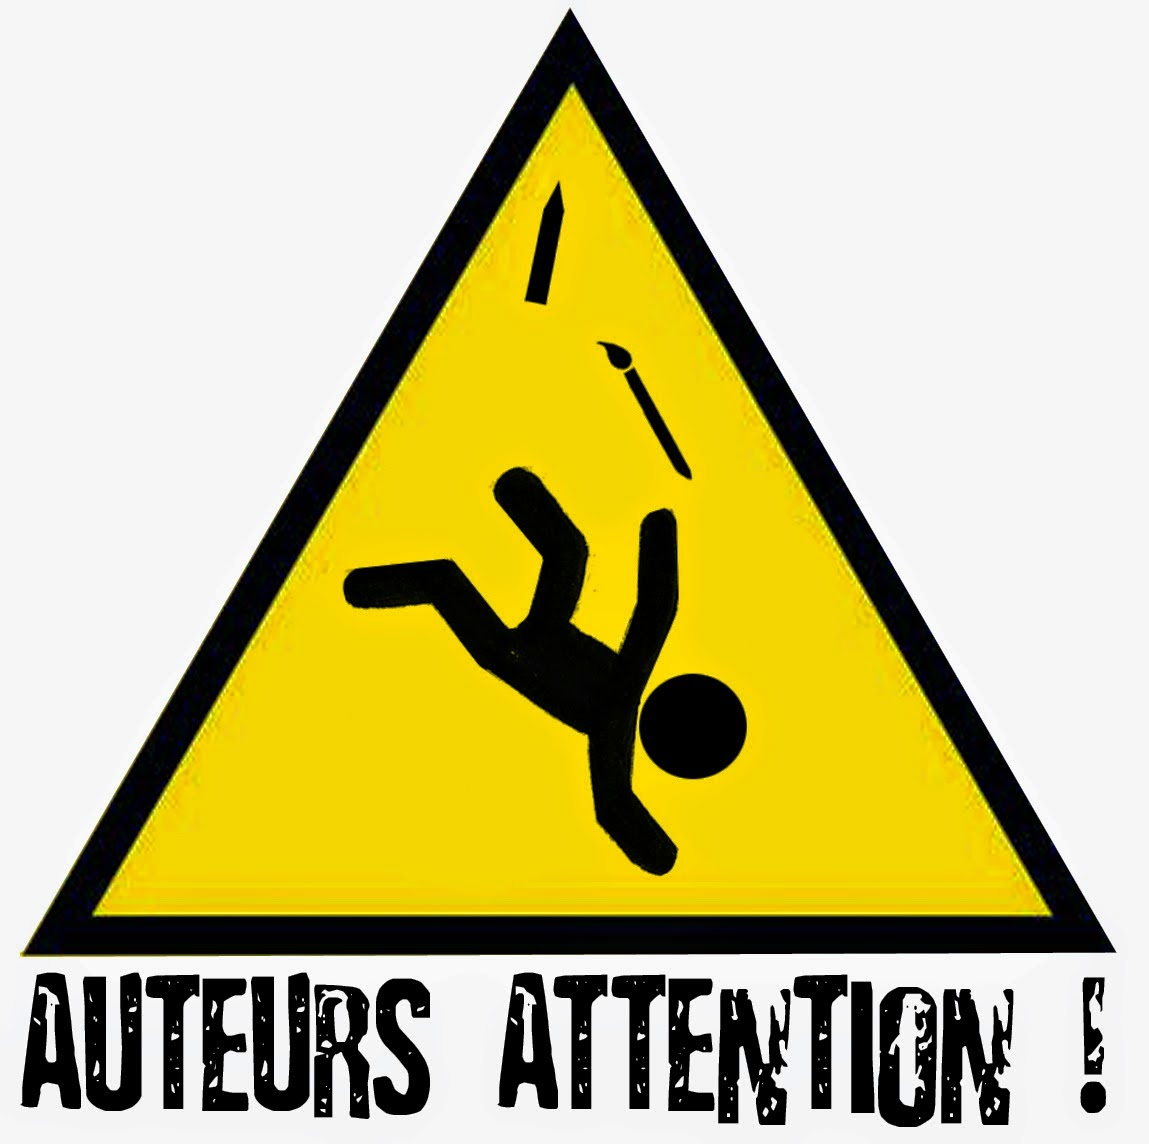 http://syndicatbd.blogspot.fr/2014/05/retraite-complementaire-ce-quen-pense.html